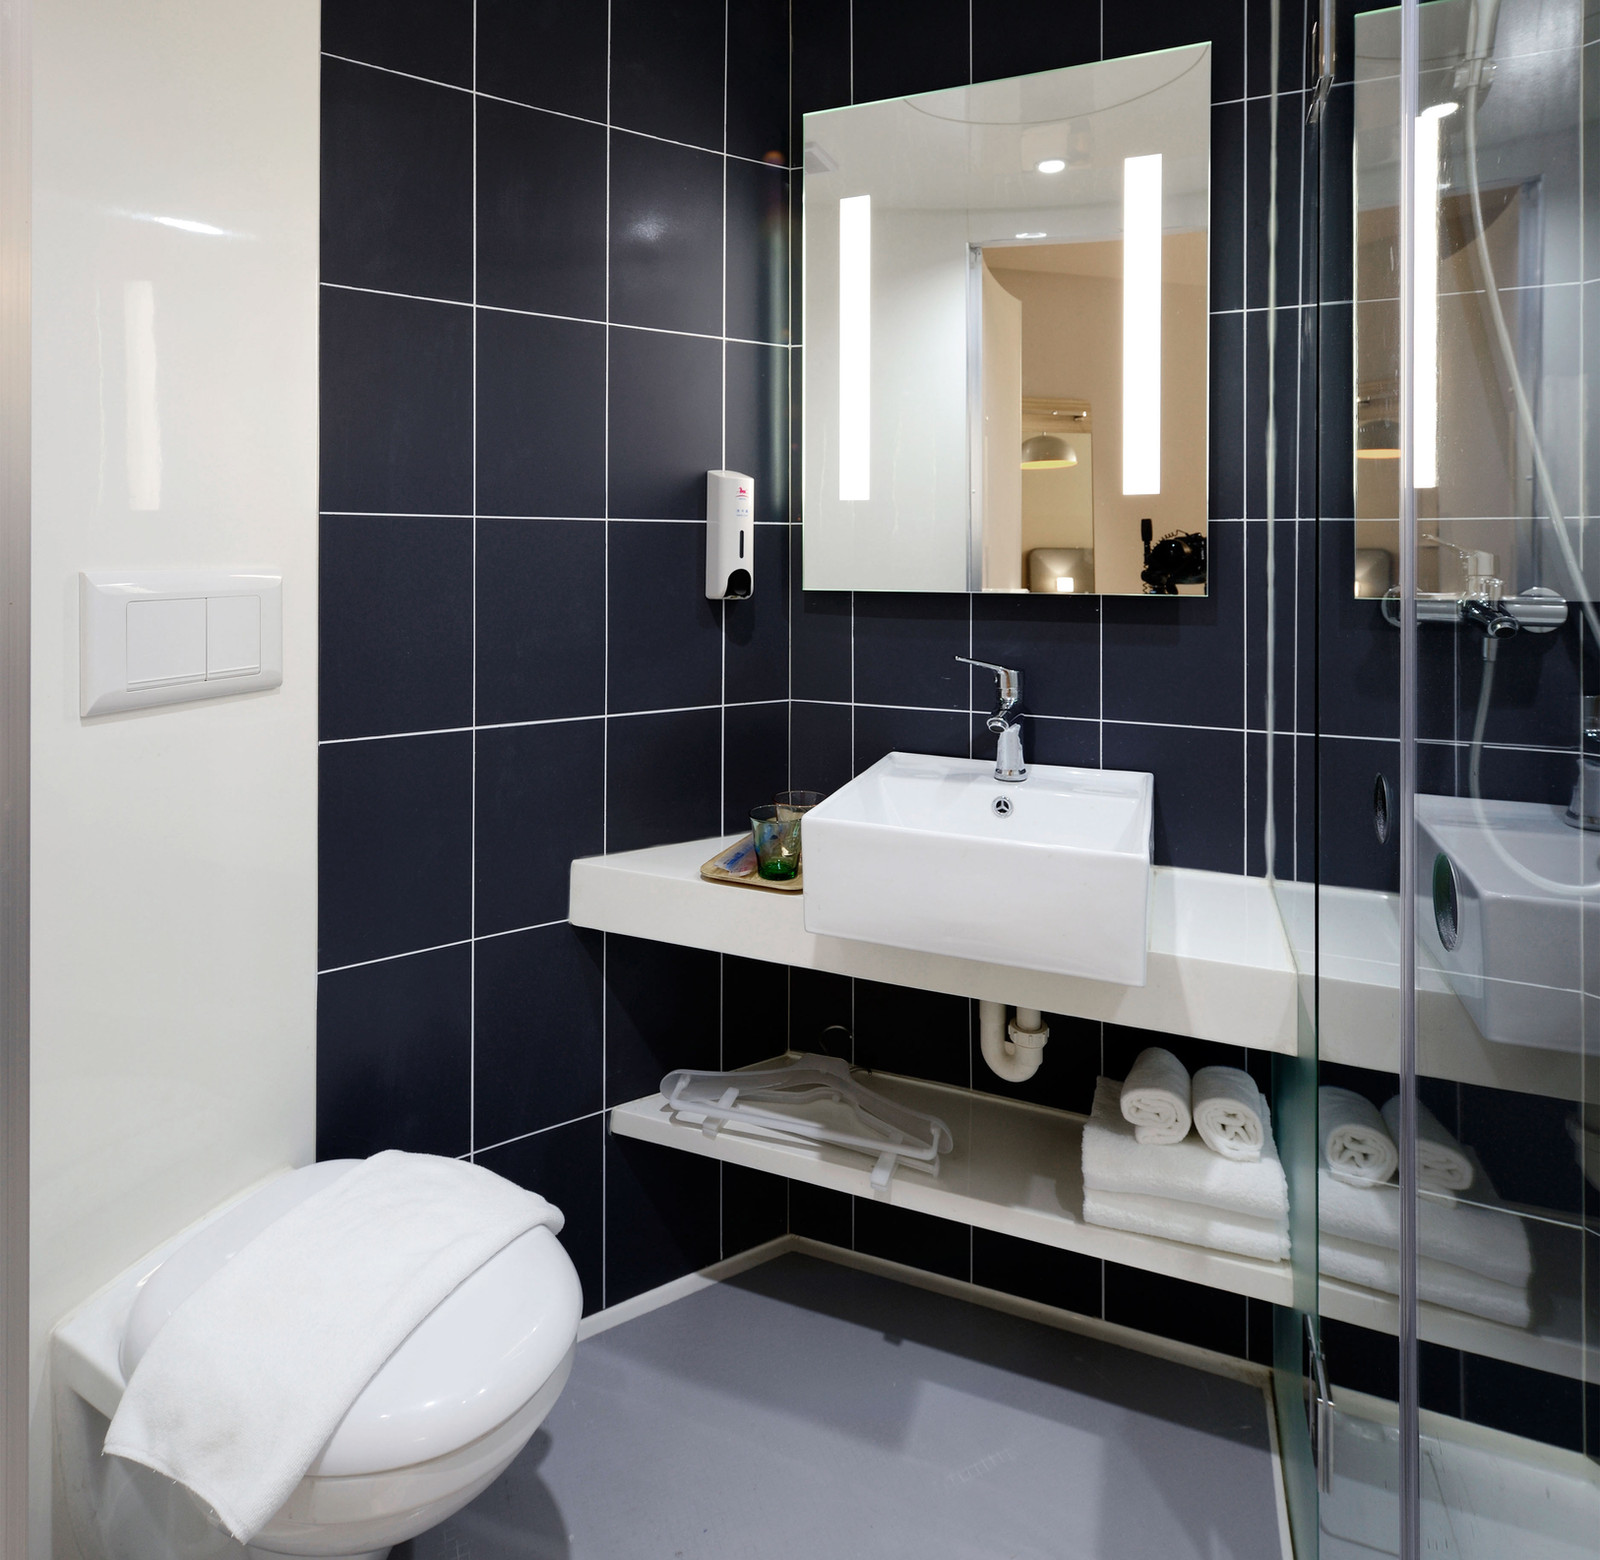 Bathroom Design Leicester Bathroom Fitters Leicester: Bathroom Installation